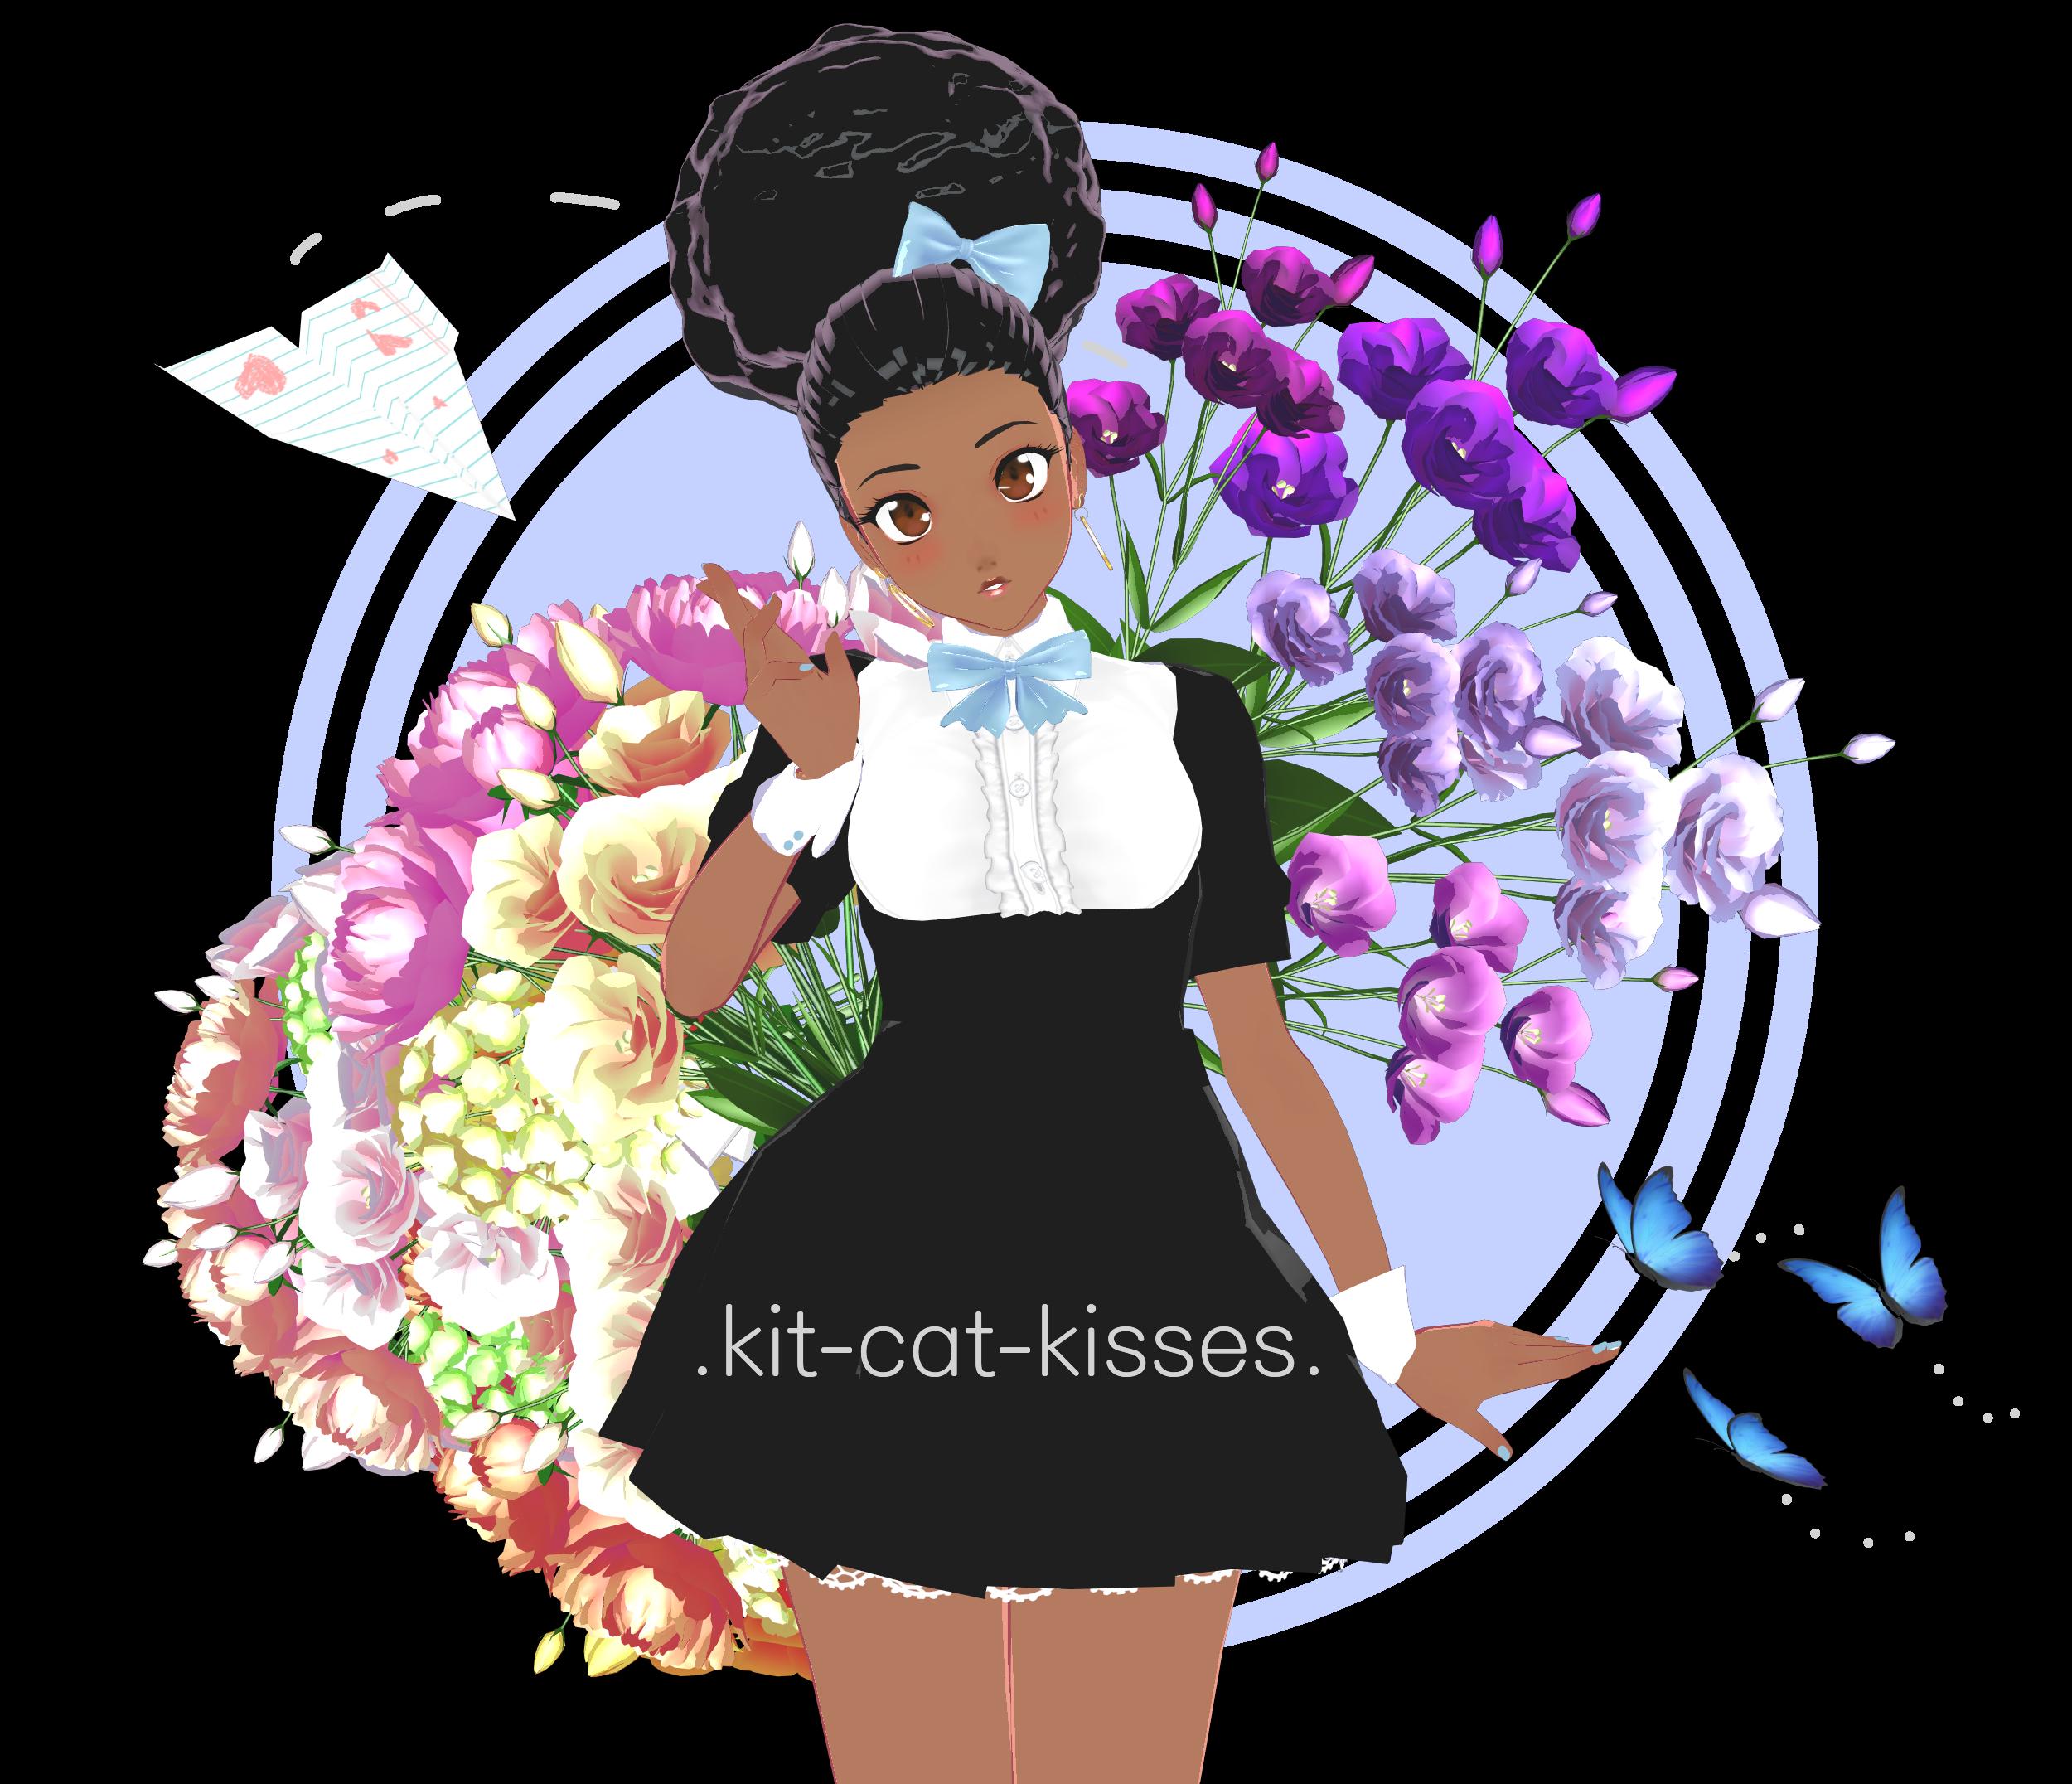 id. by Kit-Cat-Kisses